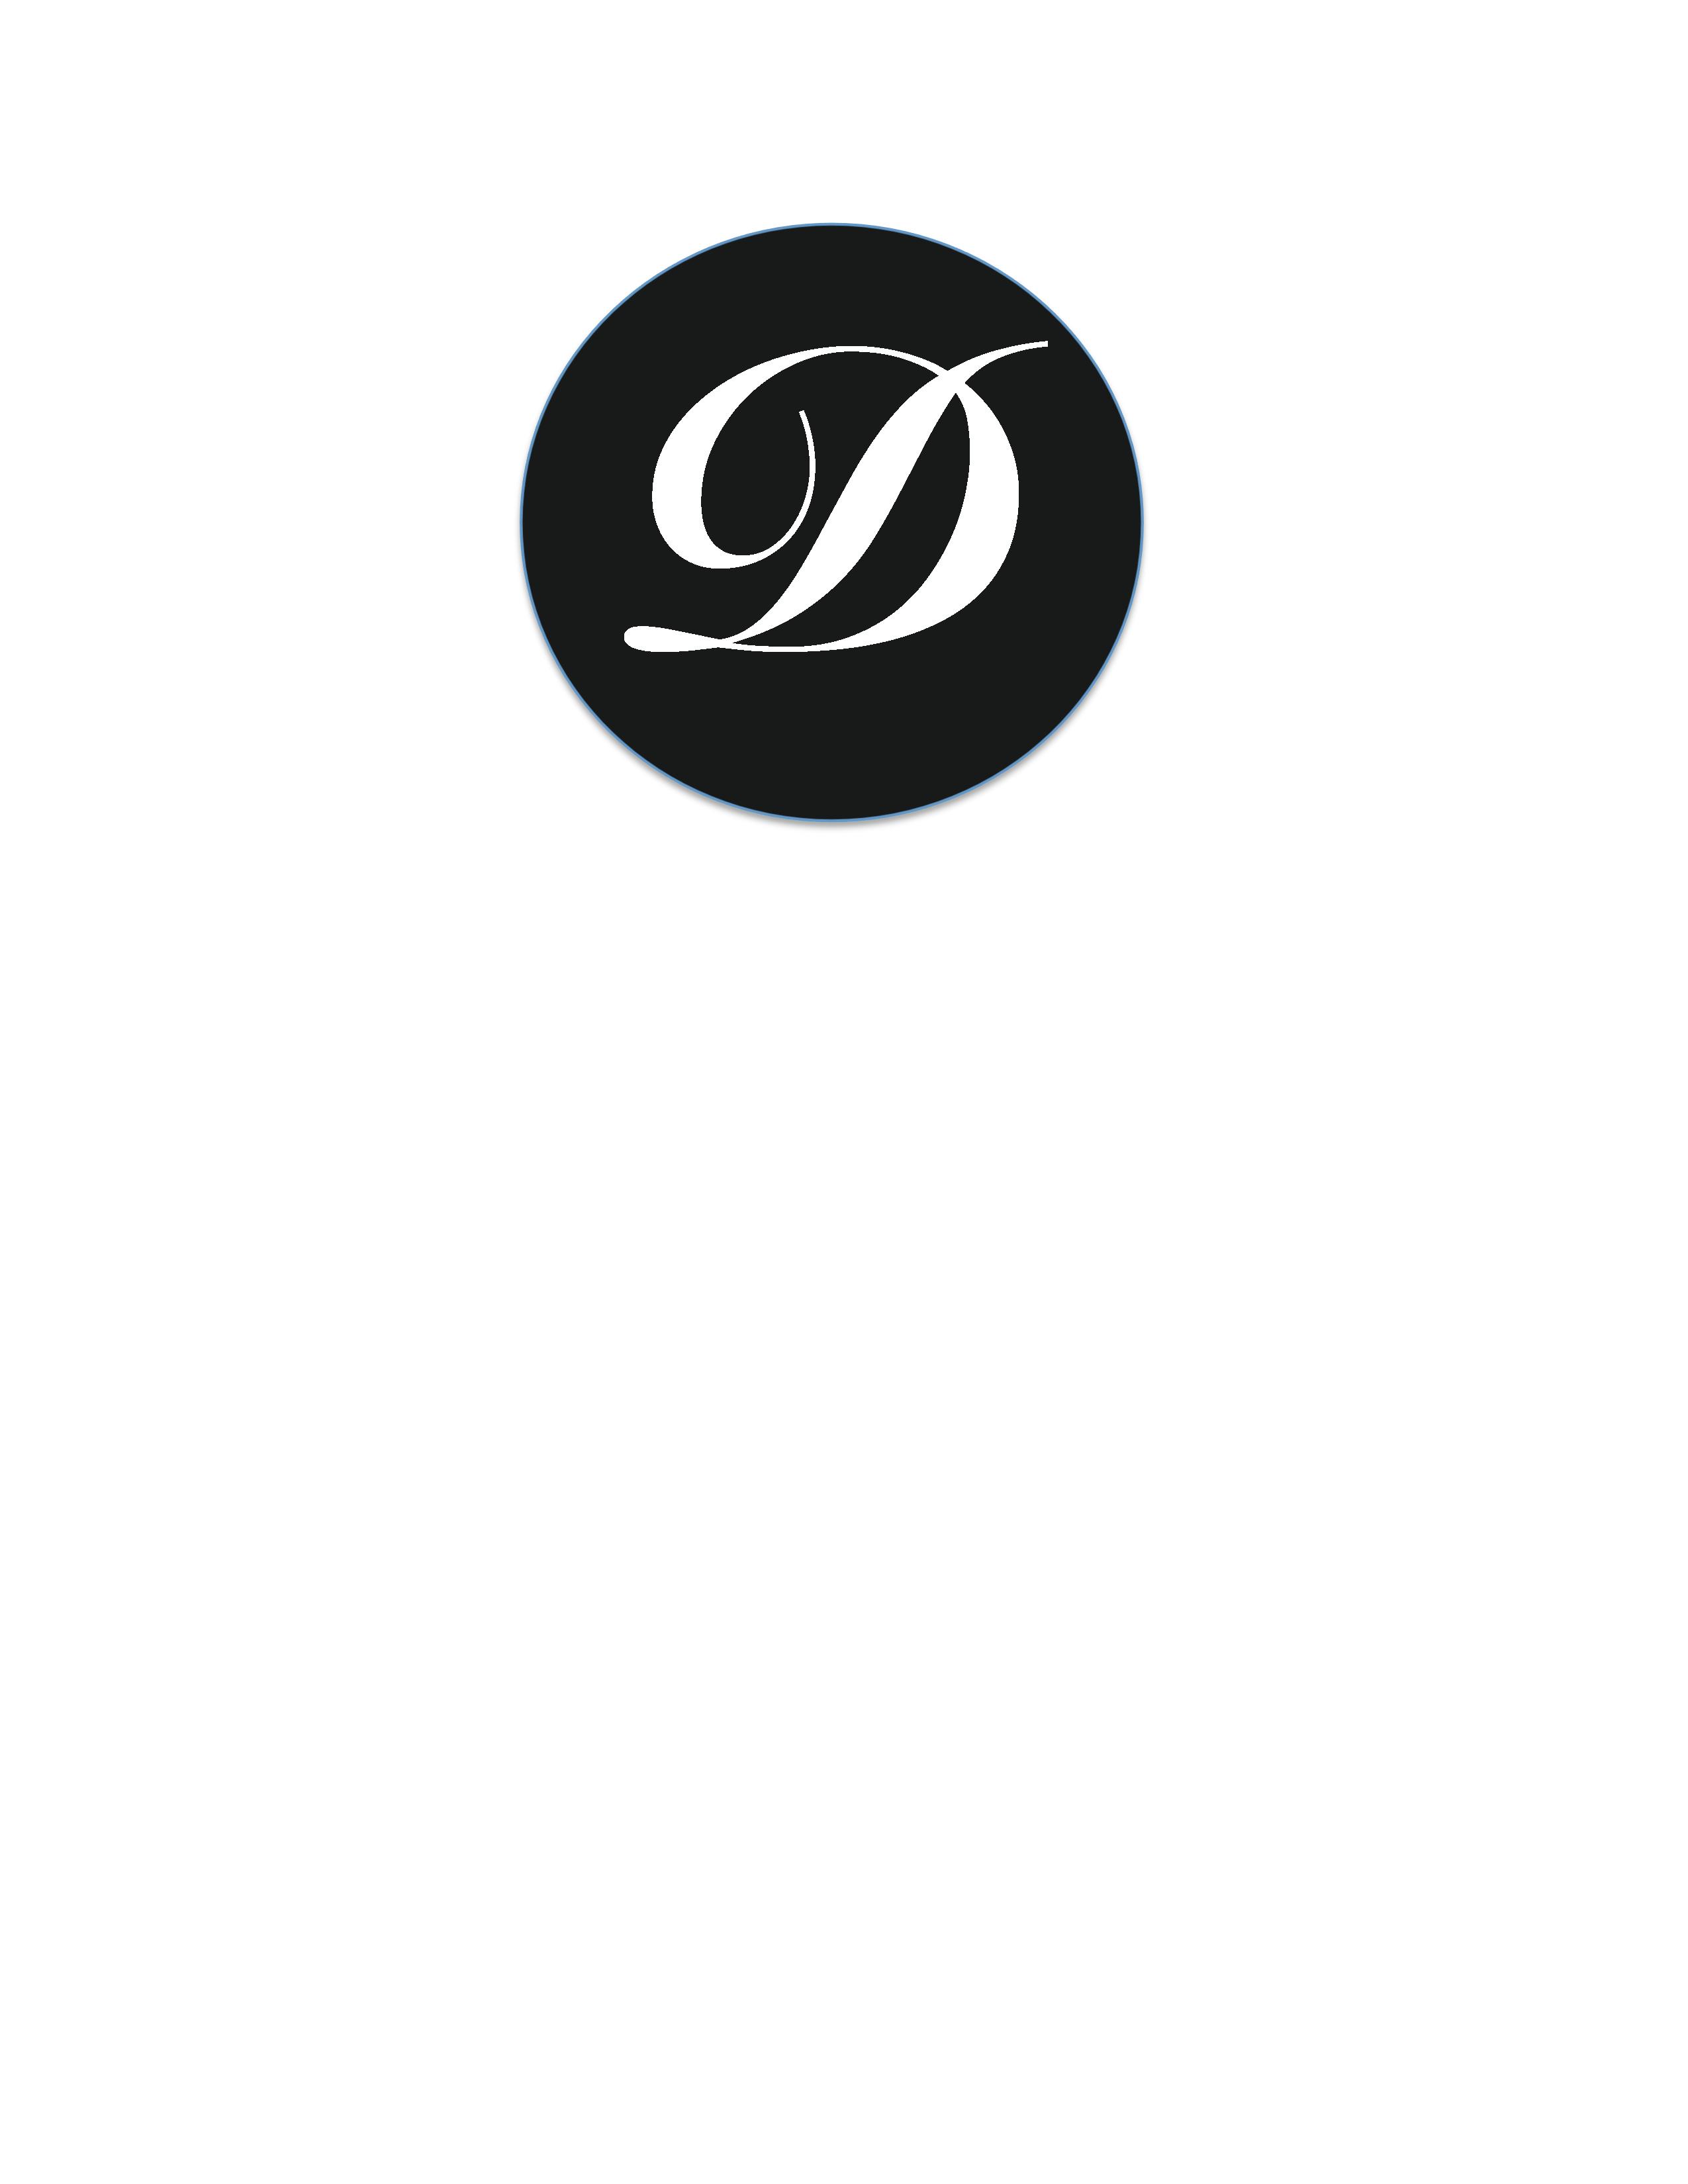 Domalbri LLC